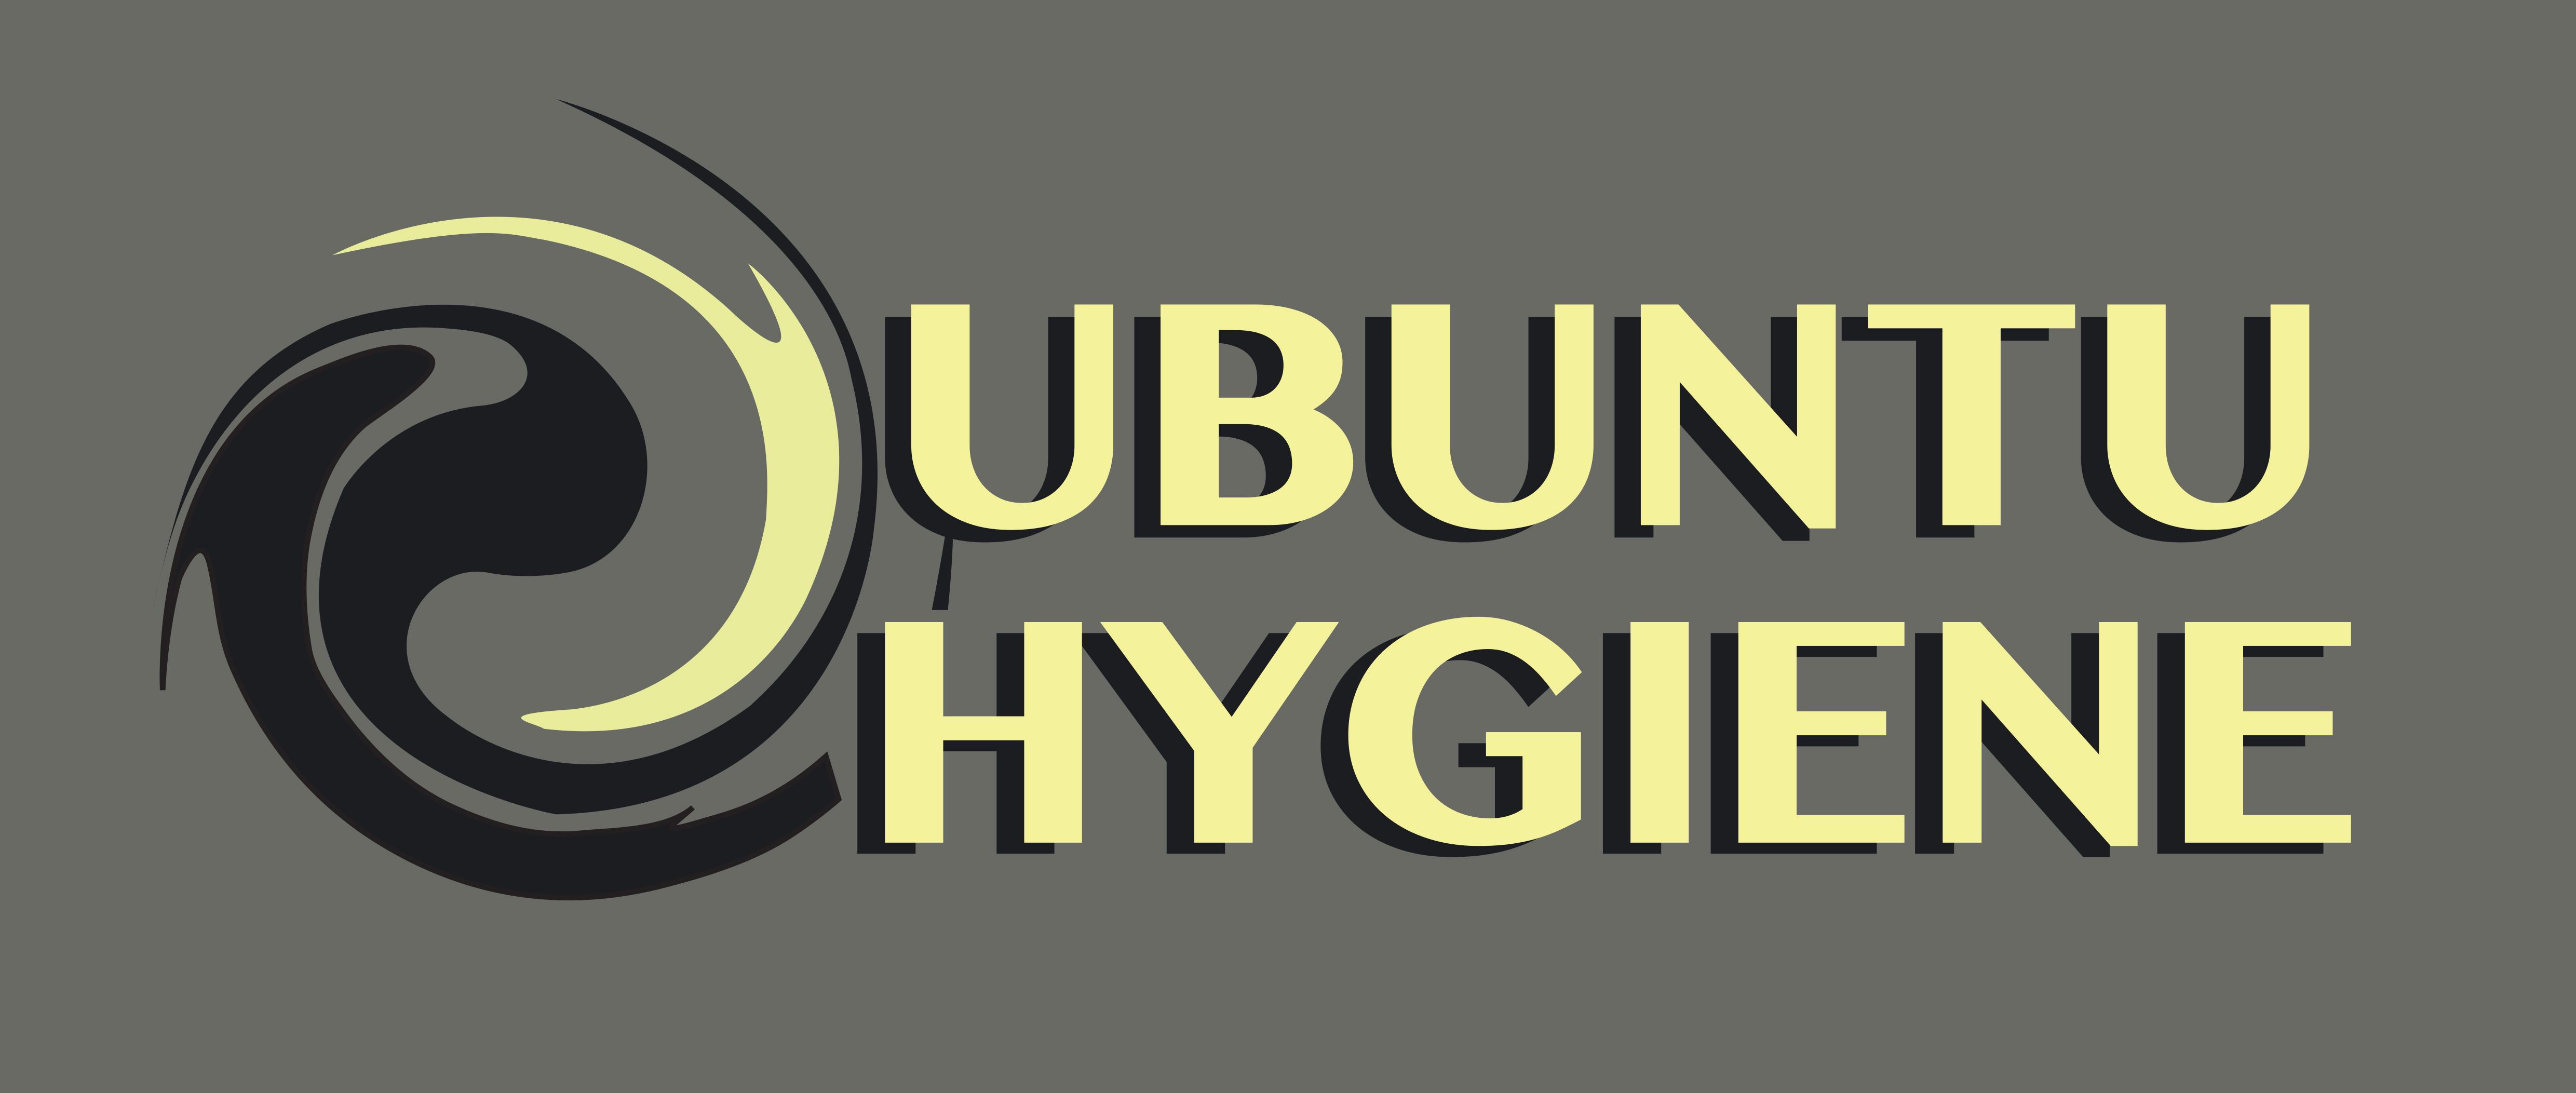 Ubuntu Hygiene